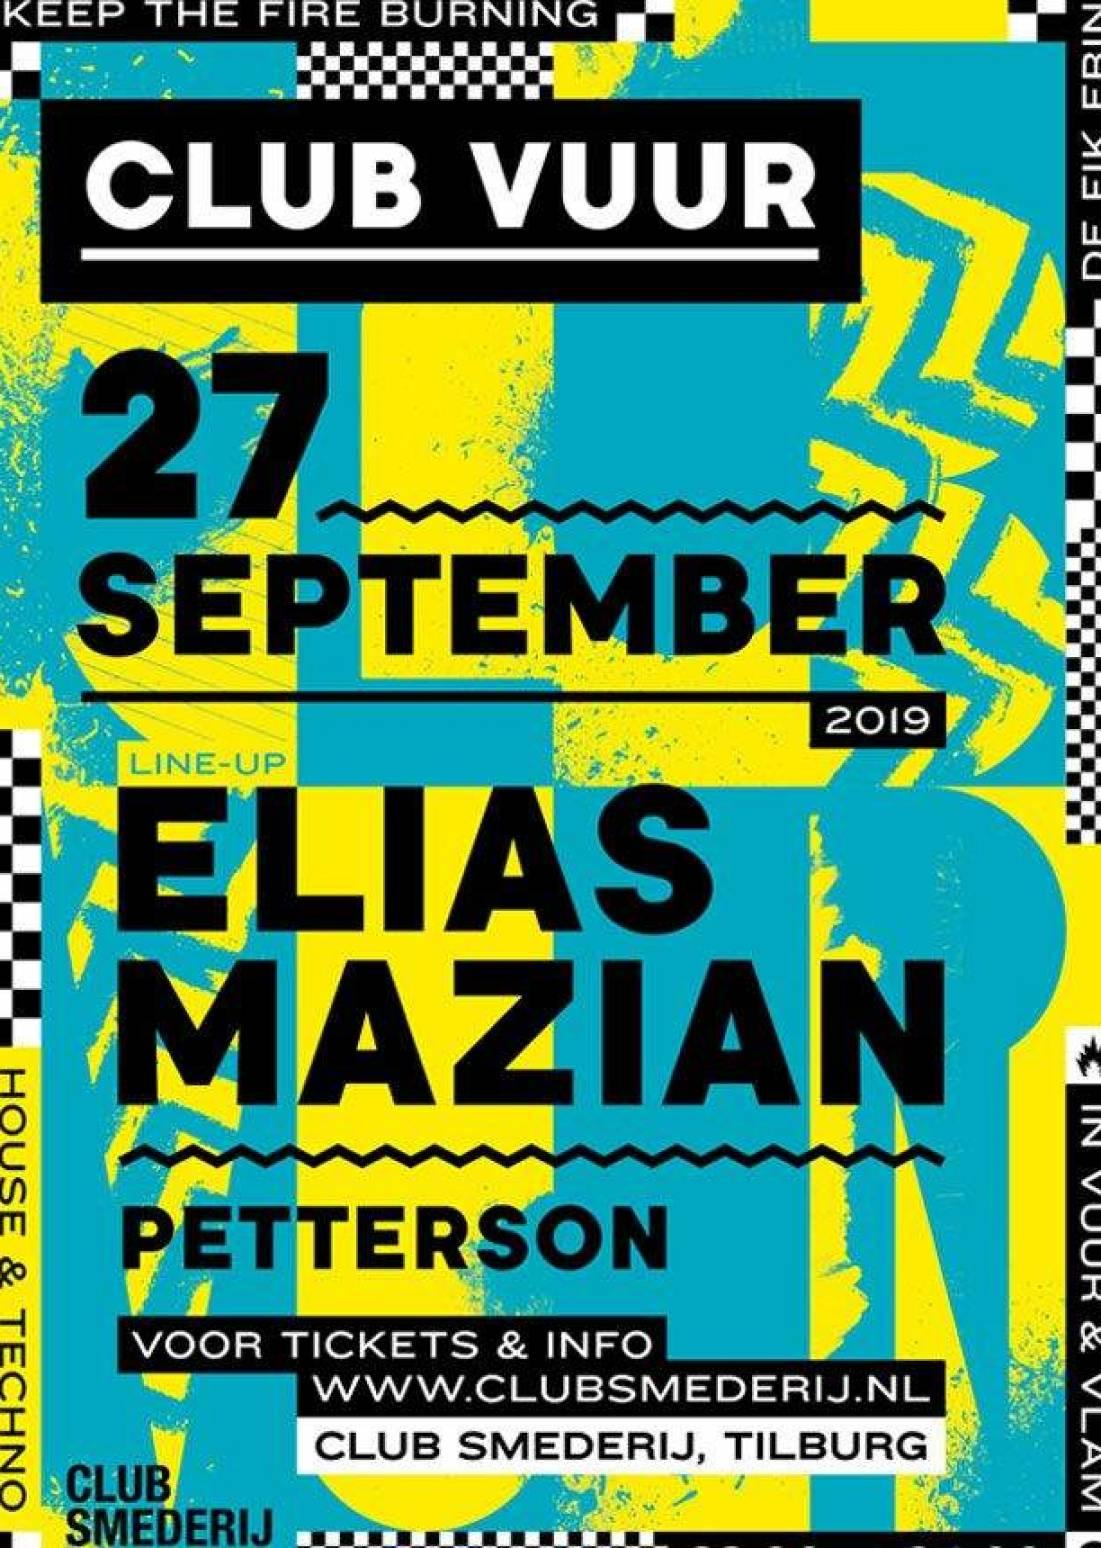 Club Vuur w/ Elias Mazian